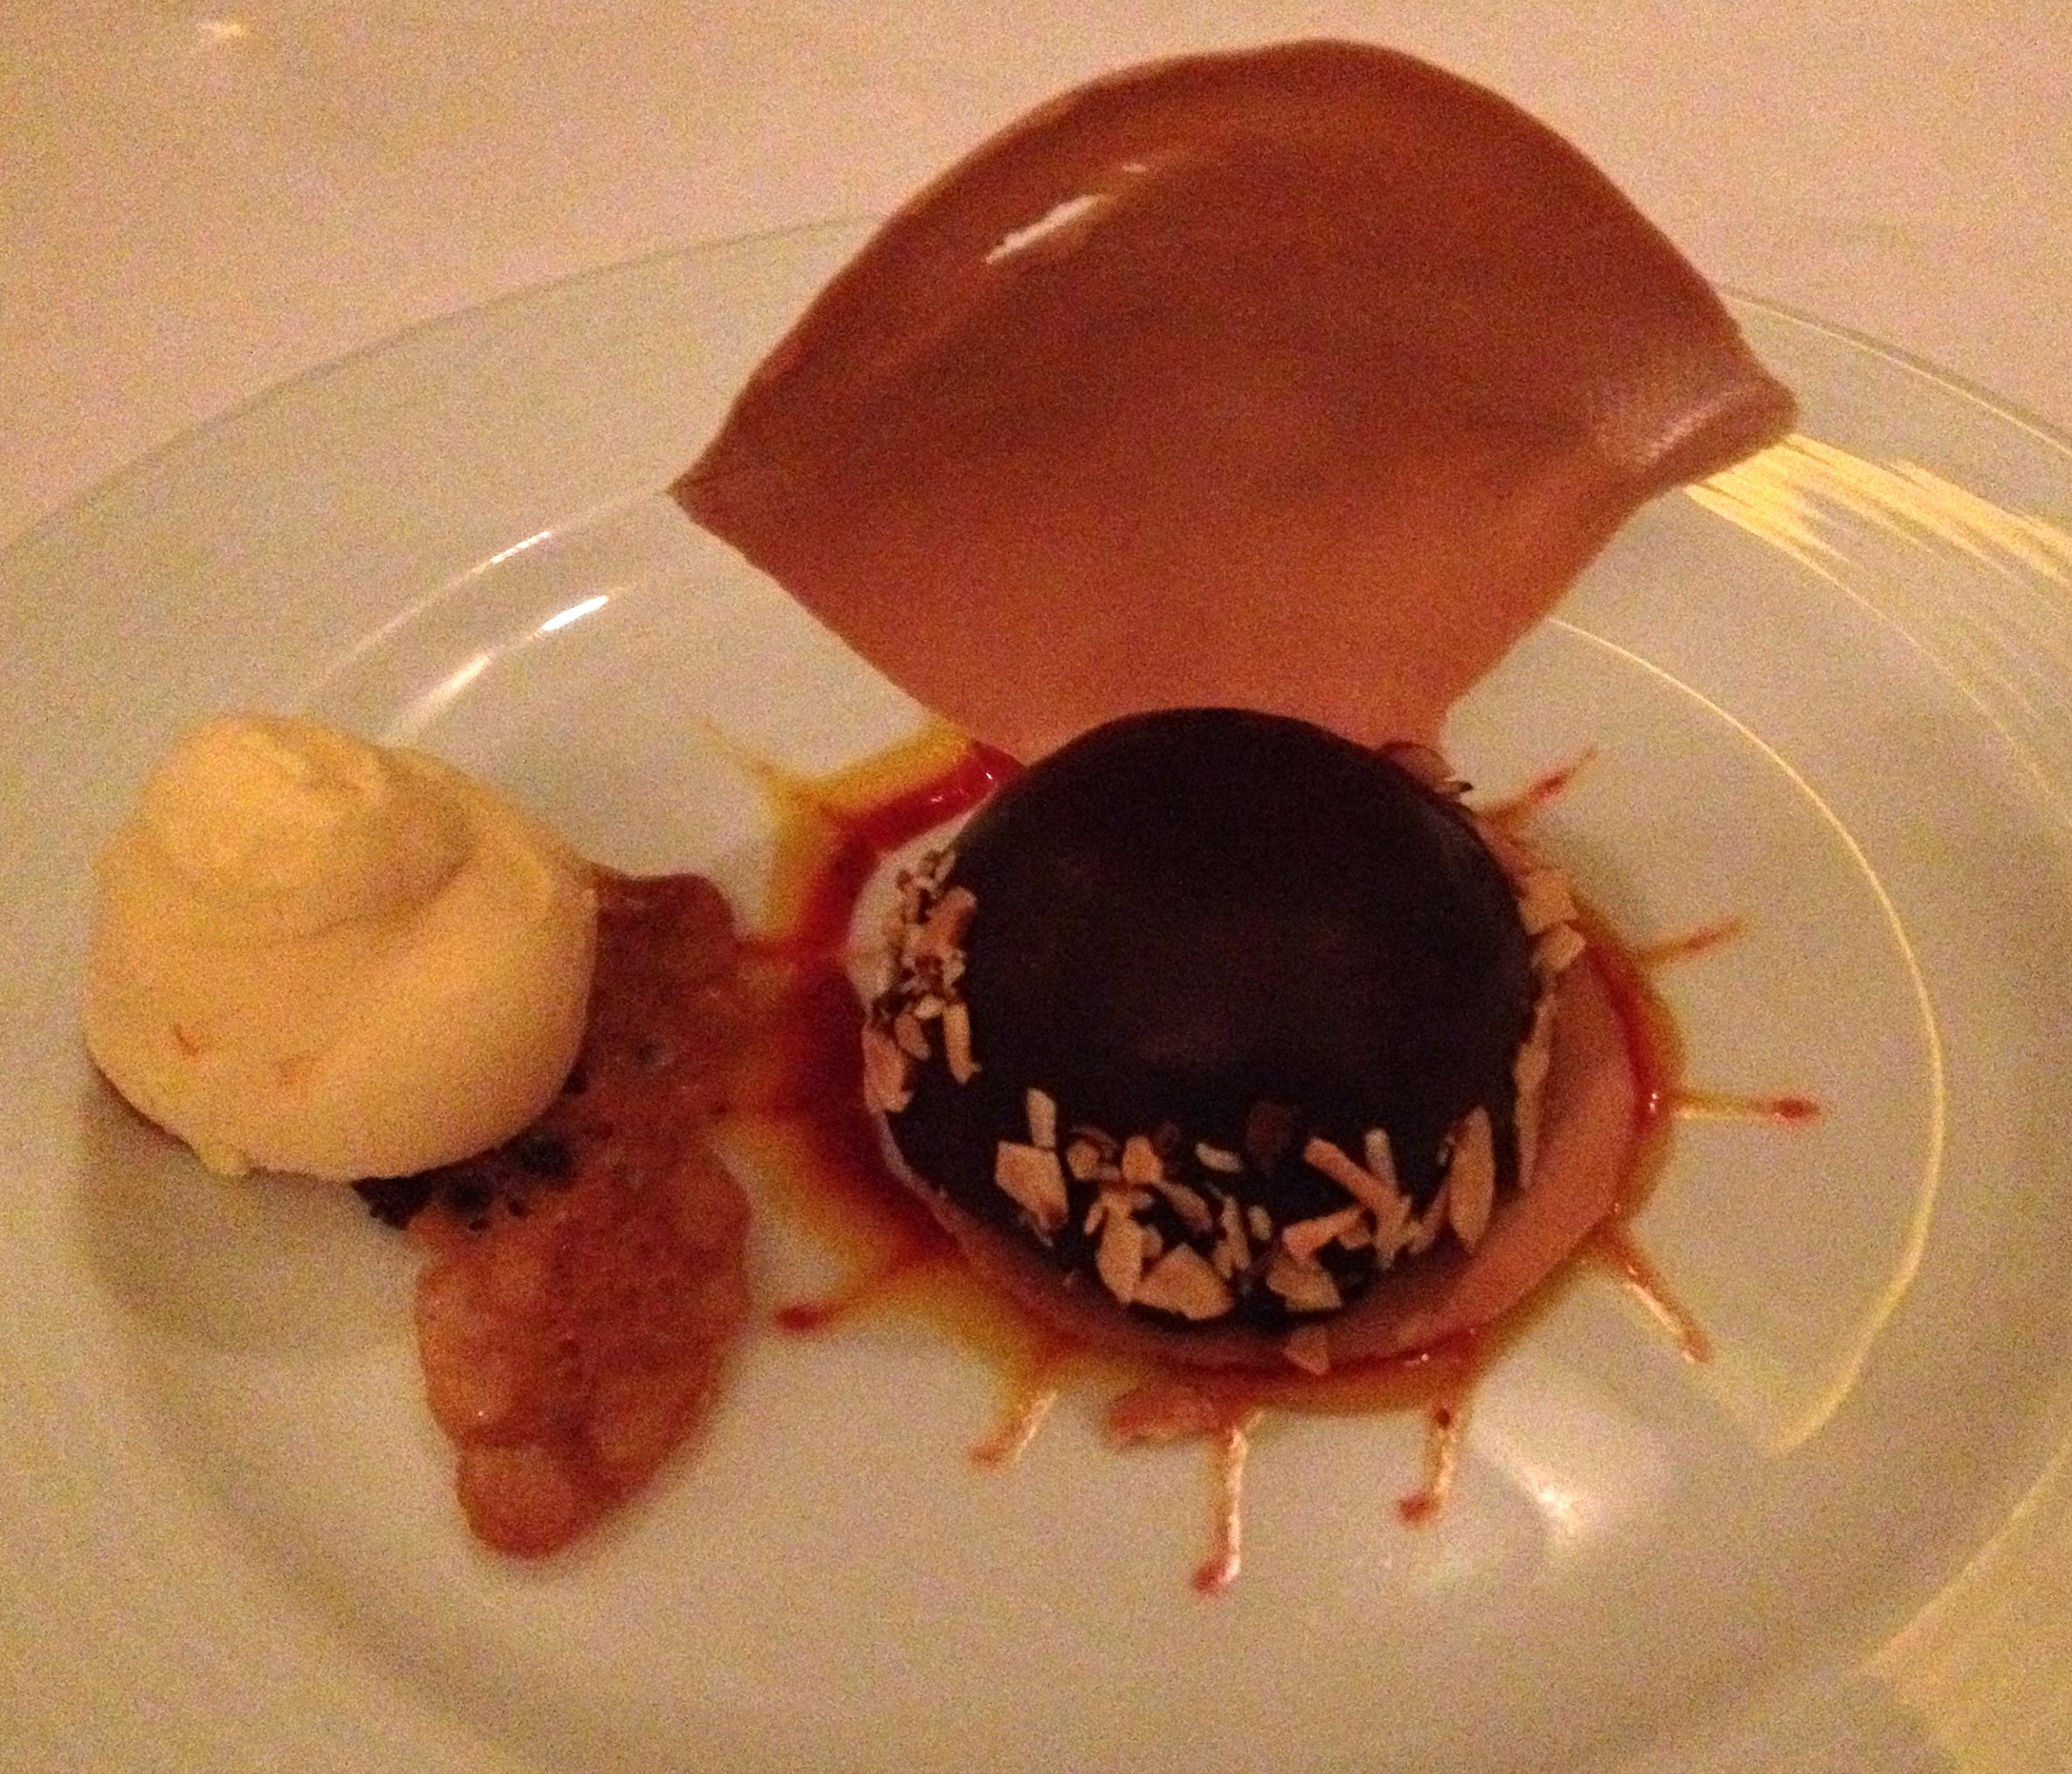 Inspiring Kitchen dining Mexico chocolate dessert casa velas